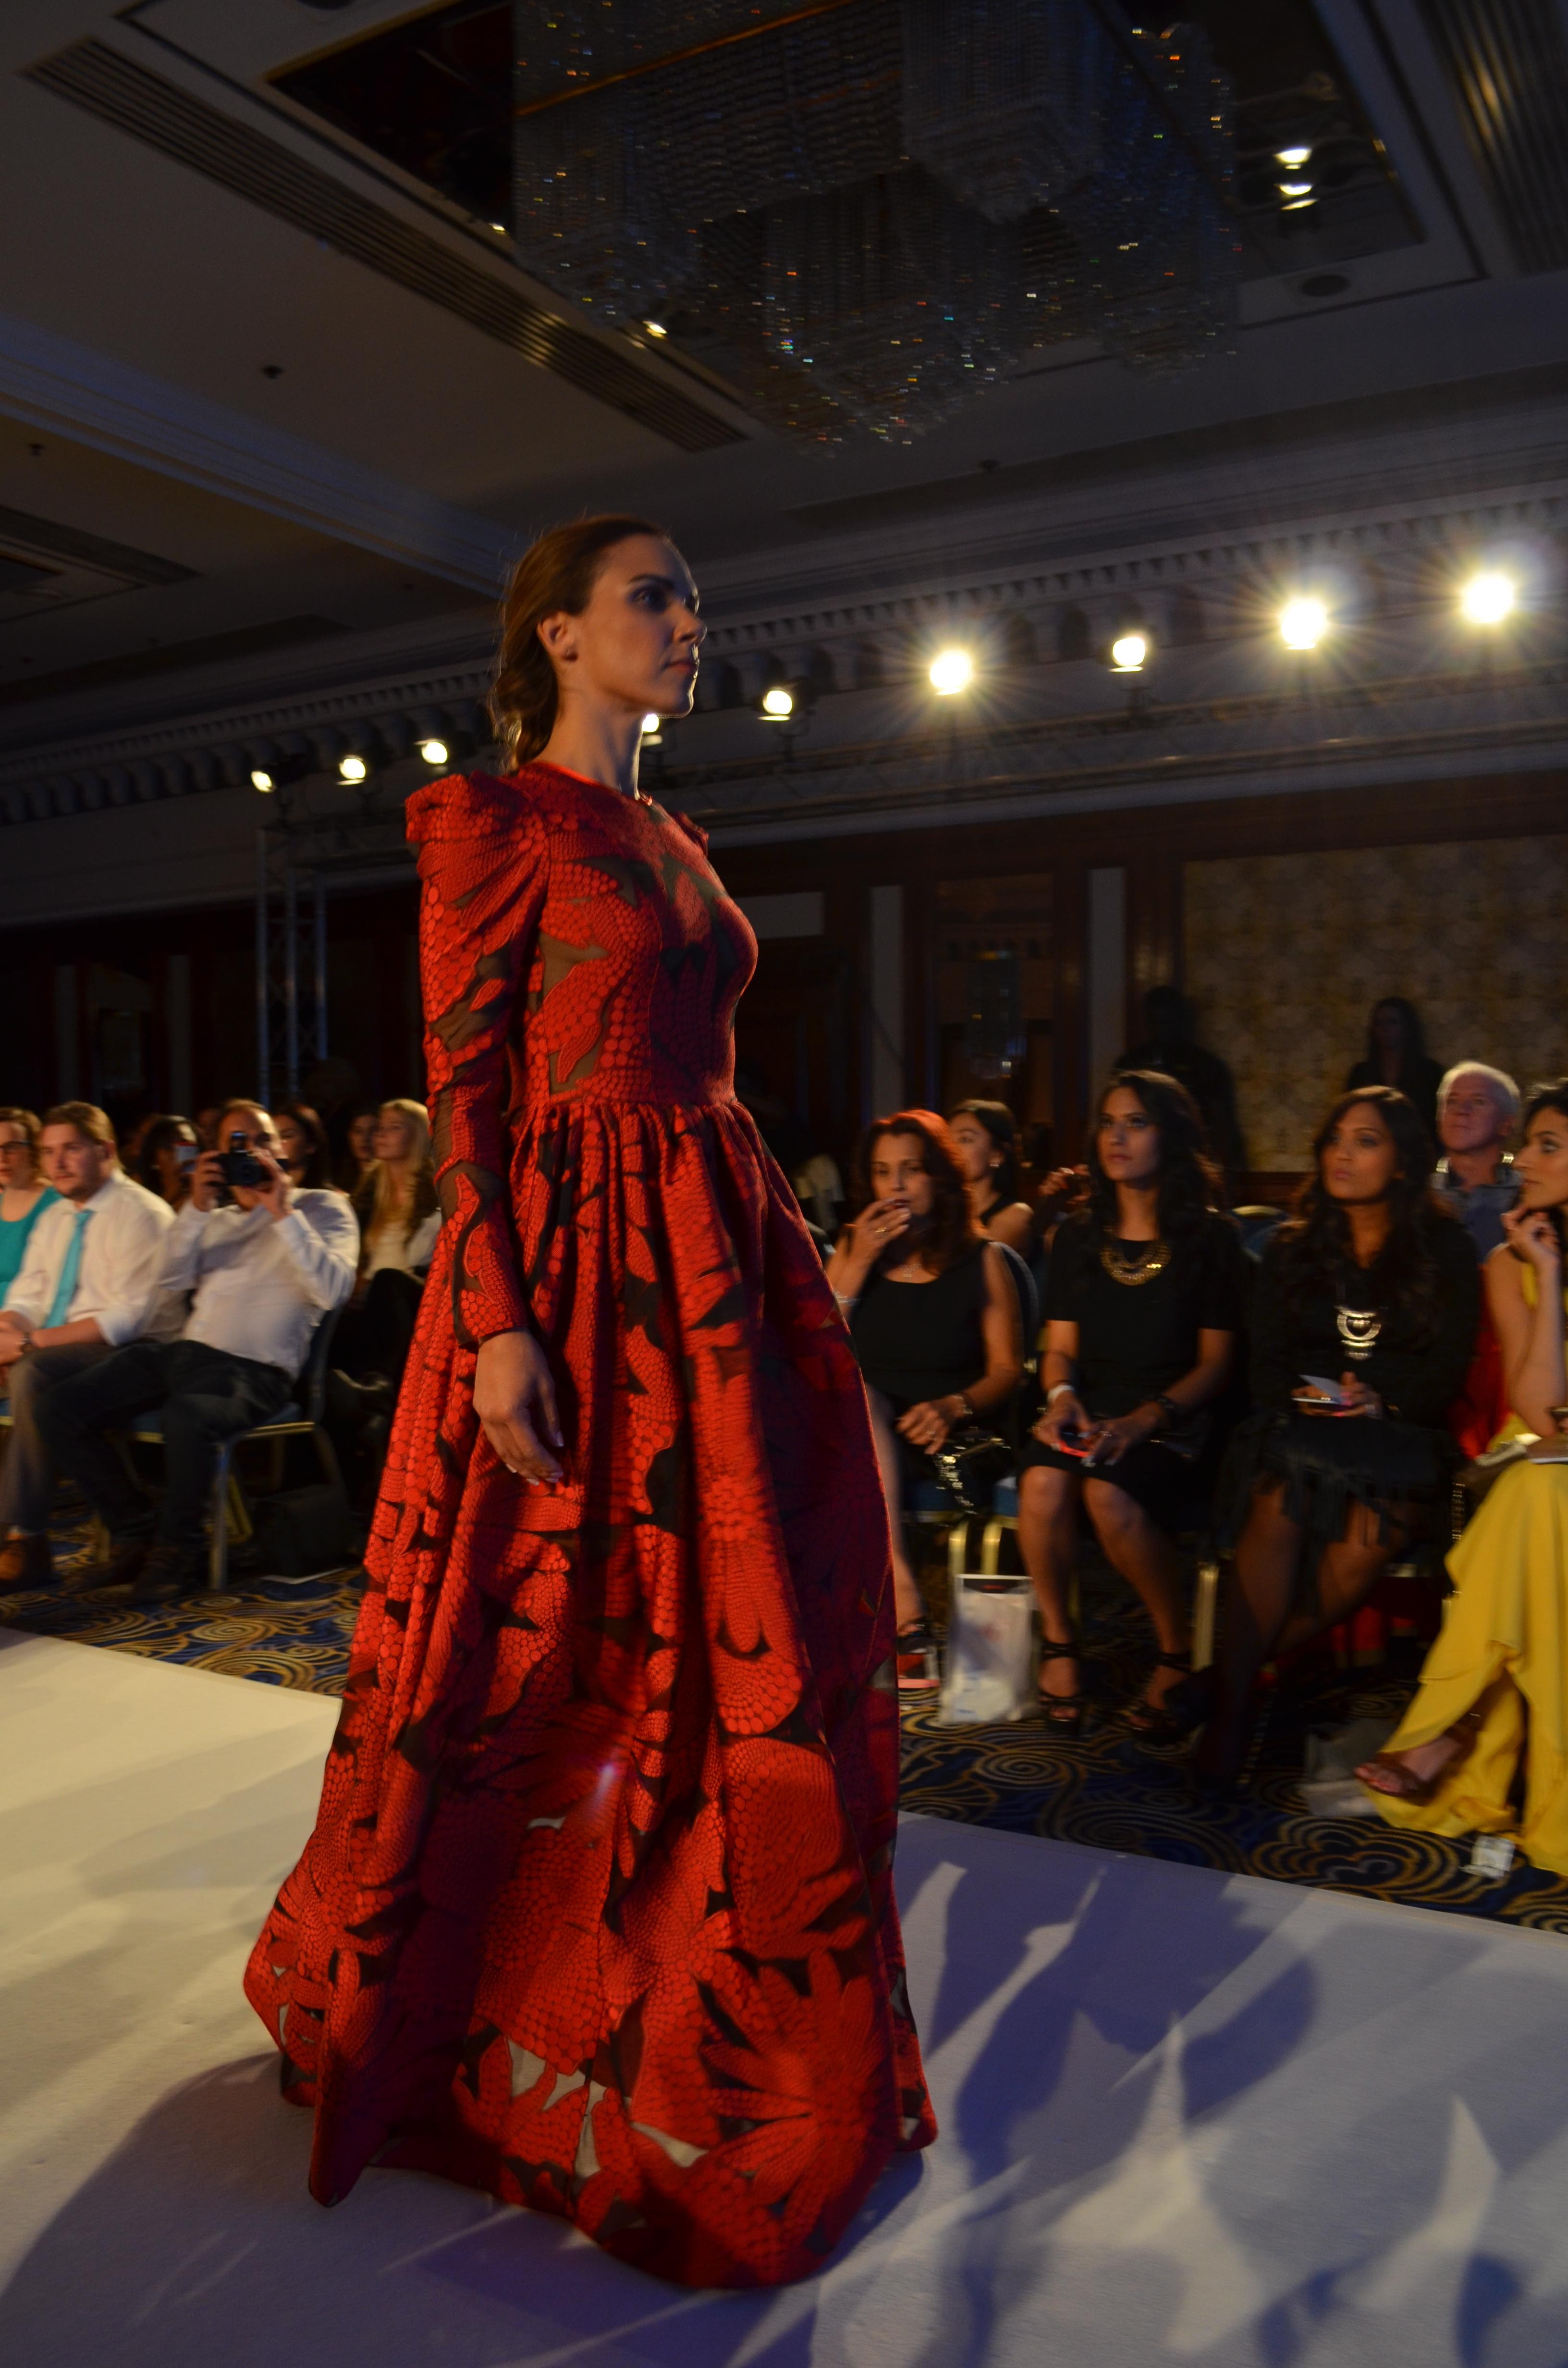 London Fashion Week - Designers 99